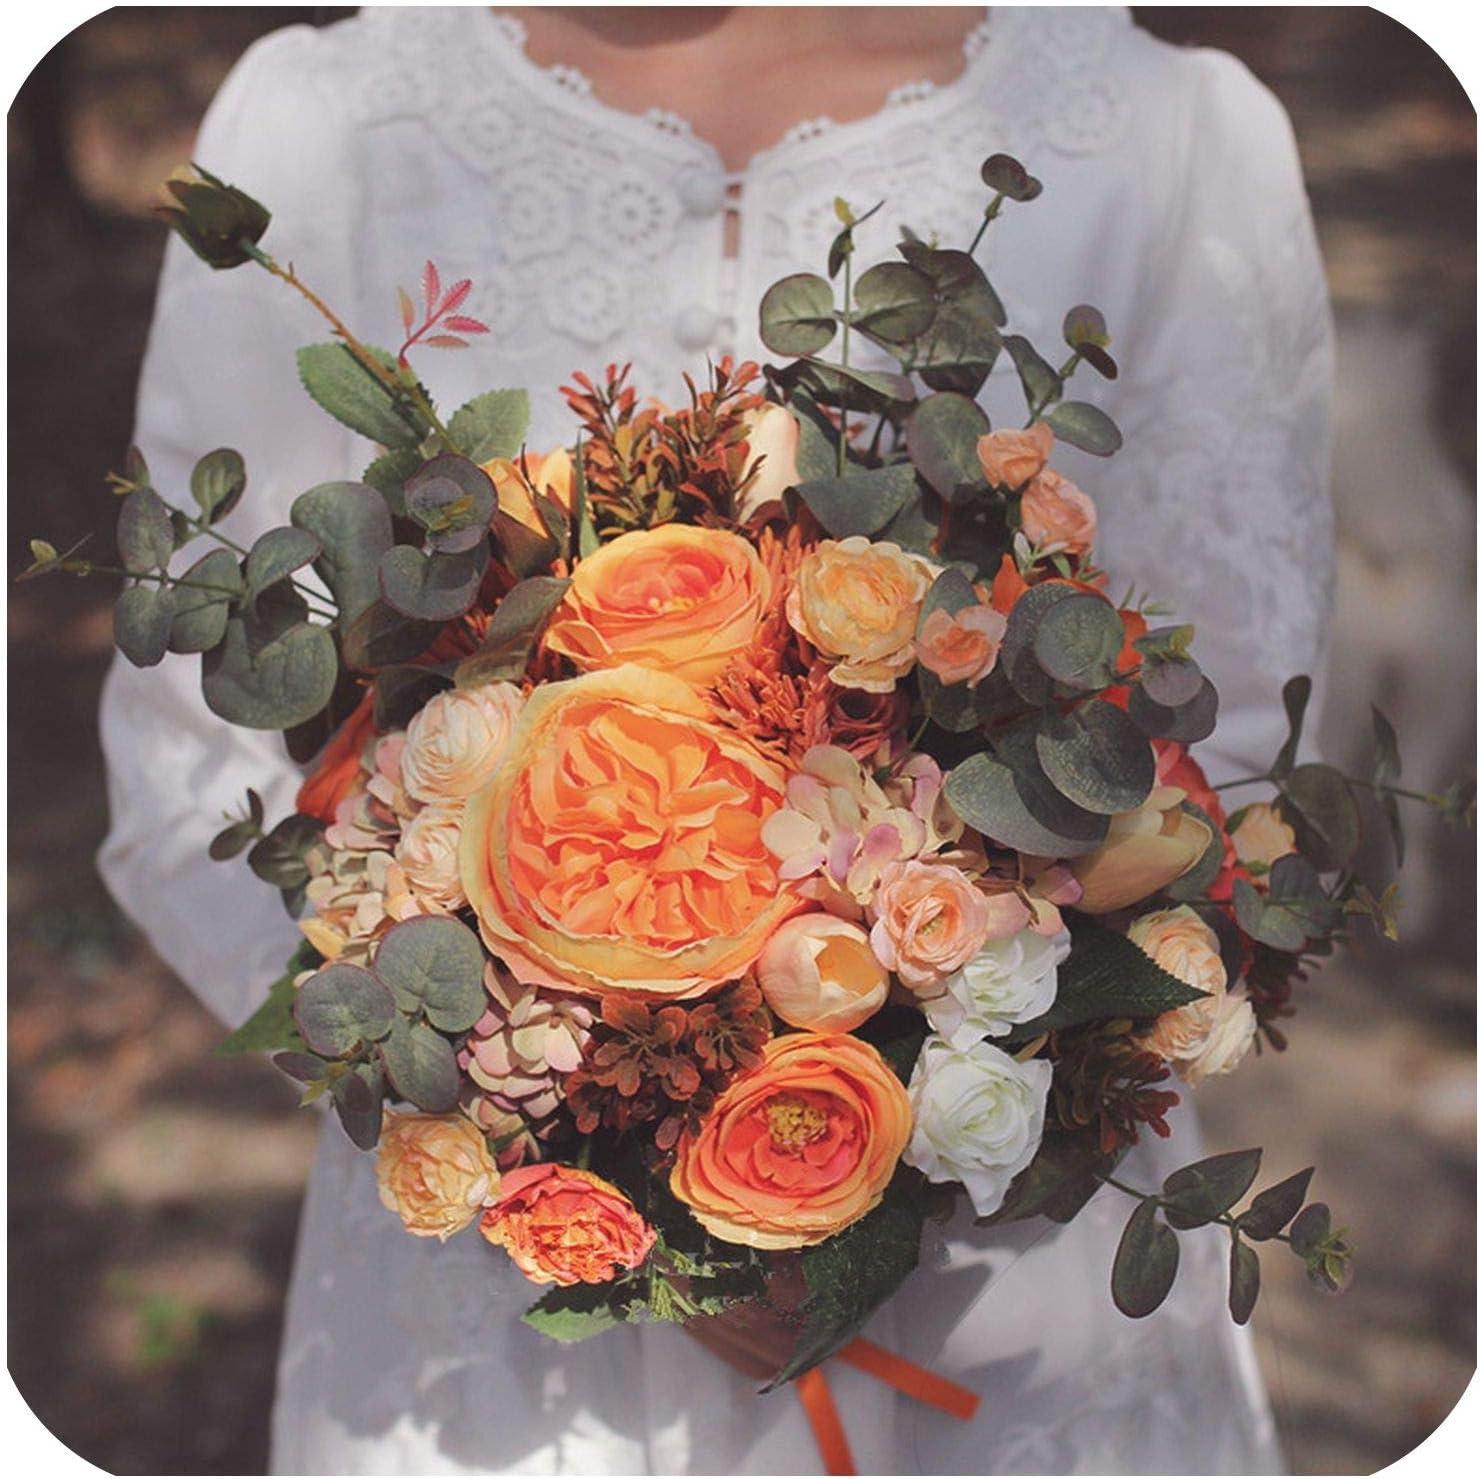 Bridal Bouquet Wedding Flowers Flowers Wedding Bouquet Wedding Artificial Silk Flowers Flower Bouquet Bridesmaid Bouquet Boho Bride